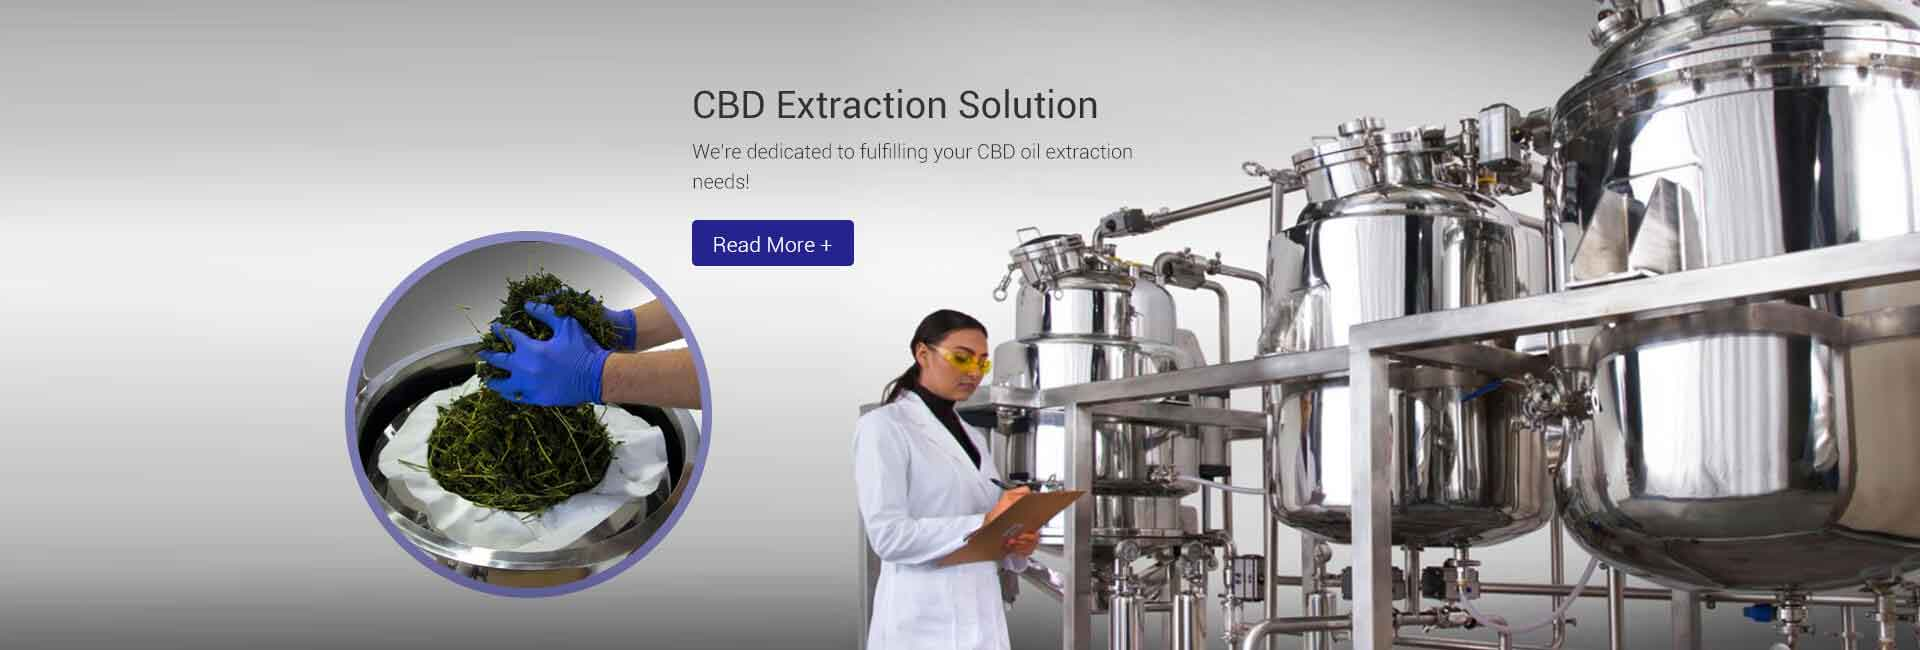 CBD Extraction Solution